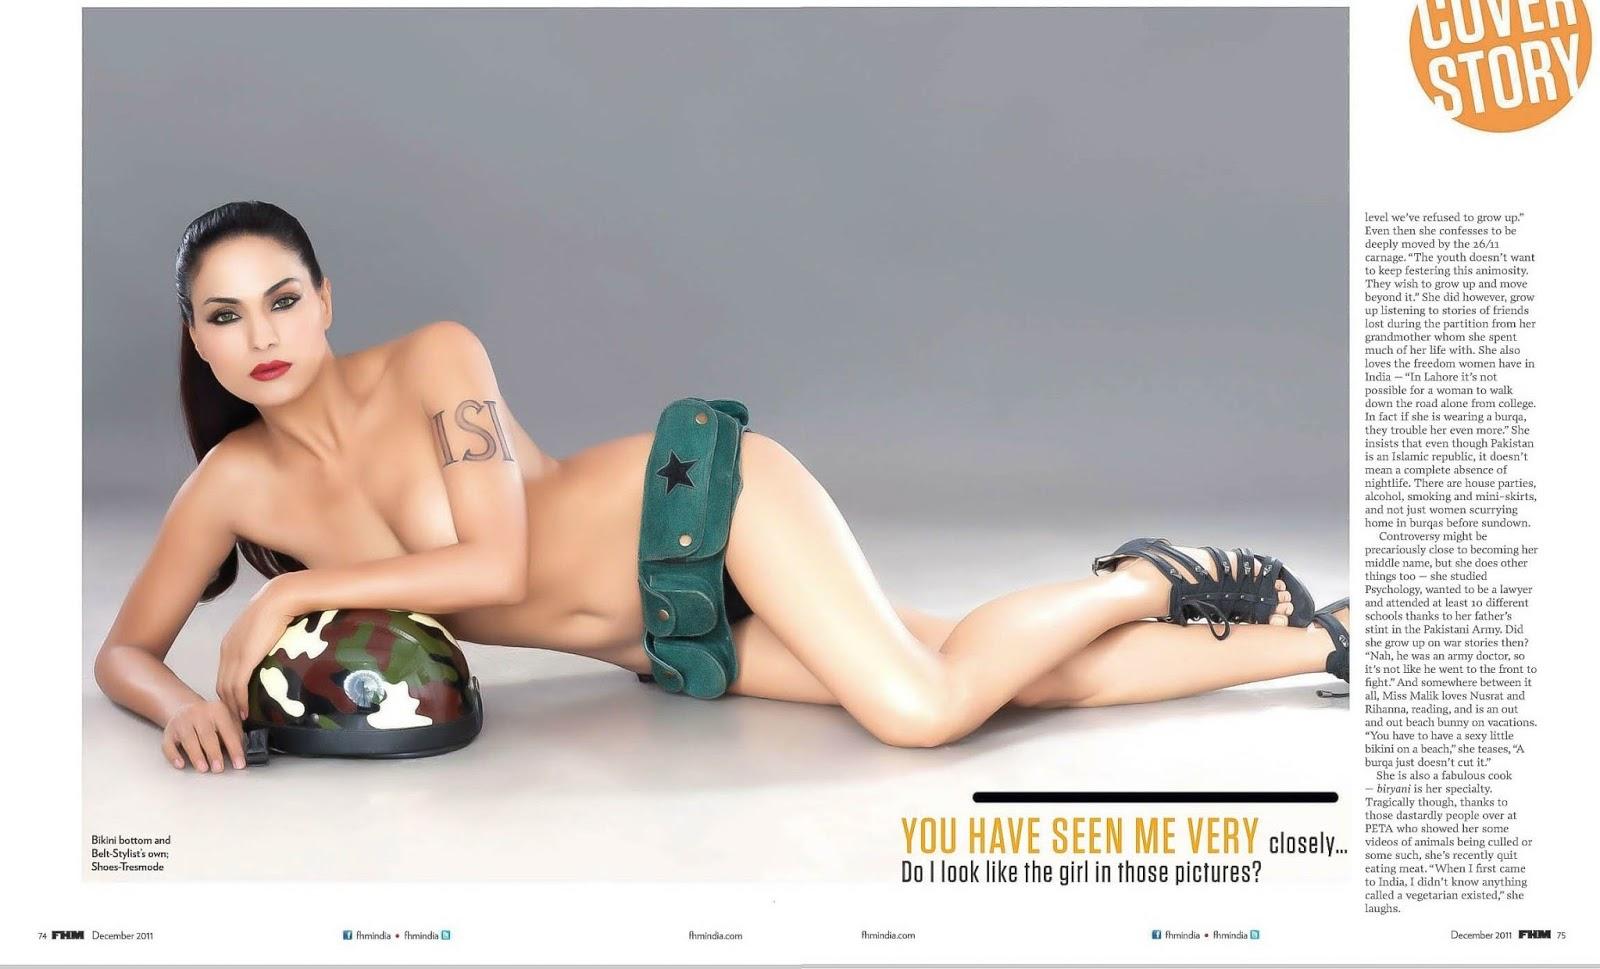 Sexy photo veena malik muscle gayporno legraybeiruthotel